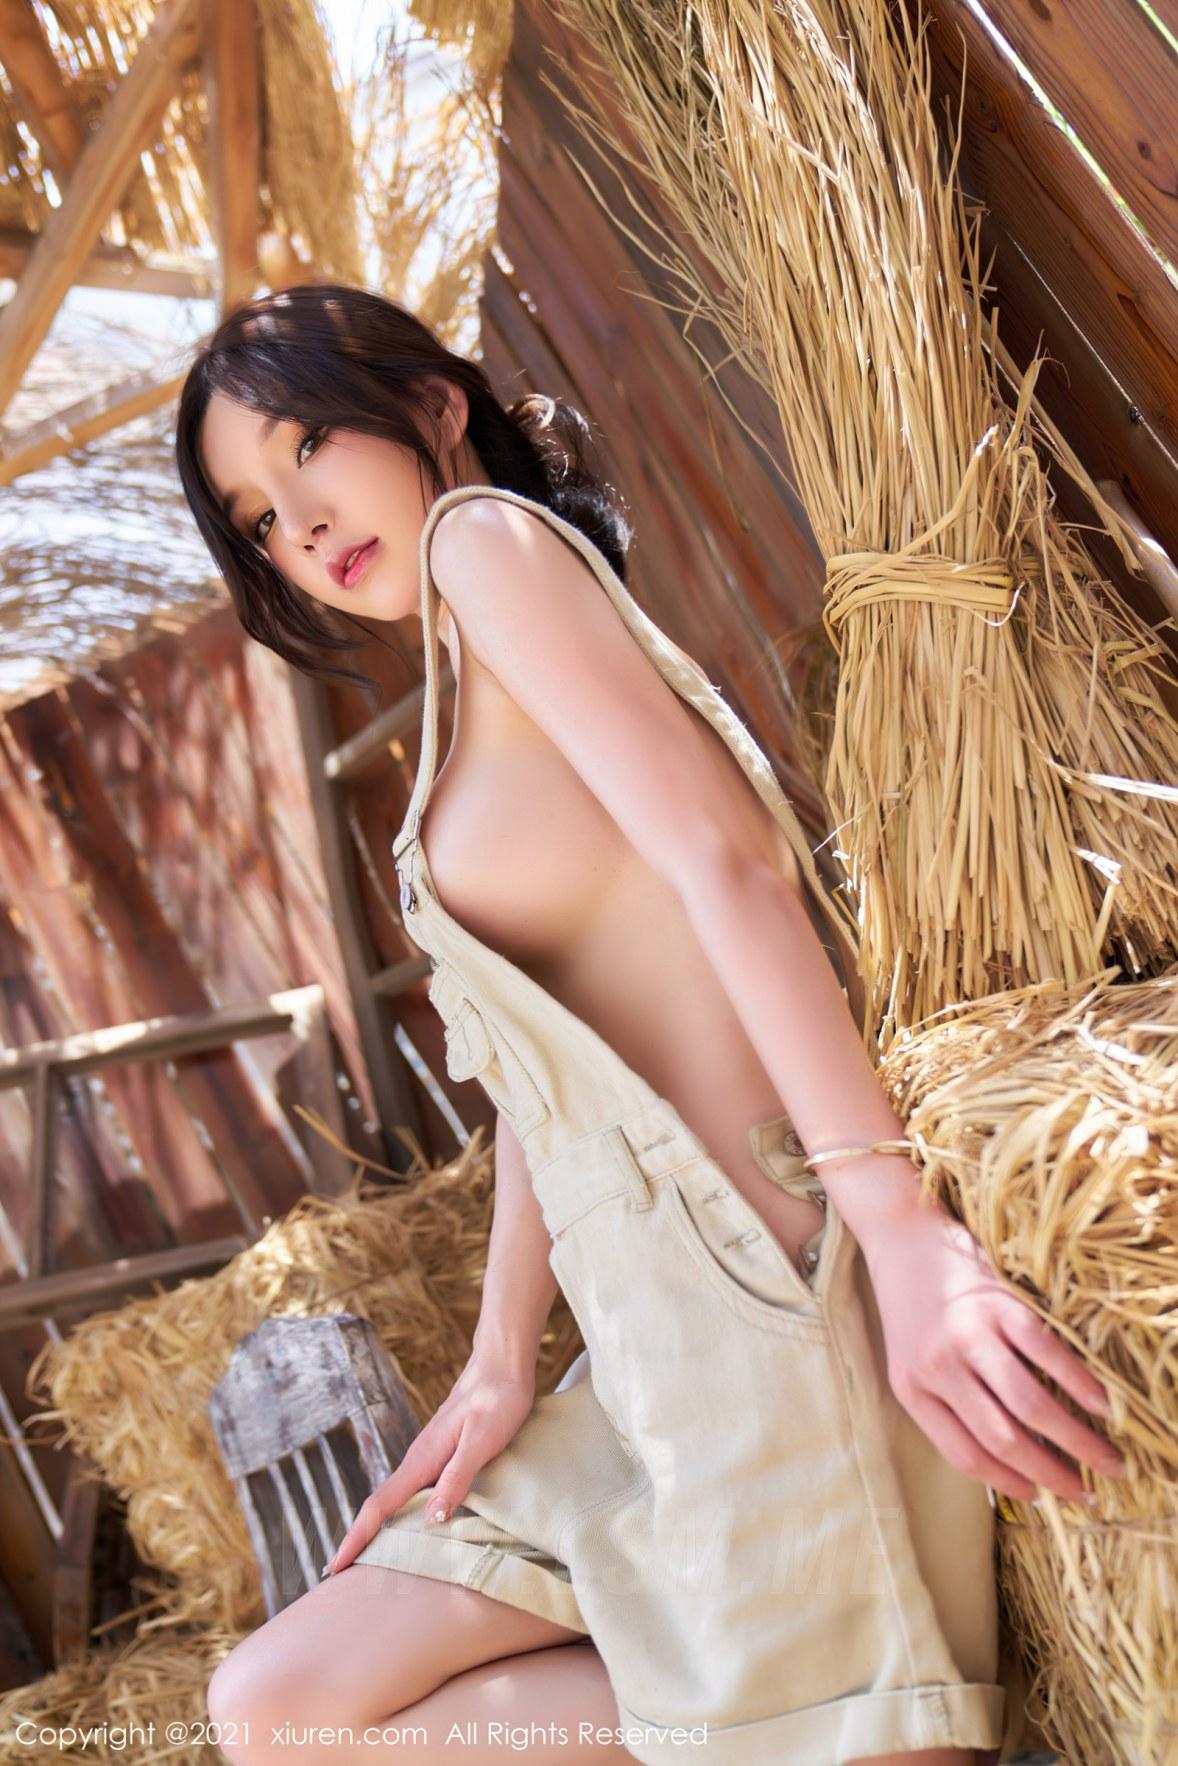 3741 053 8mn 3603 5400 - XiuRen 秀人 No.3741 西部农场风格 周于希Sandy 性感写真111 - 秀人网 -【免费在线写真】【丽人丝语】